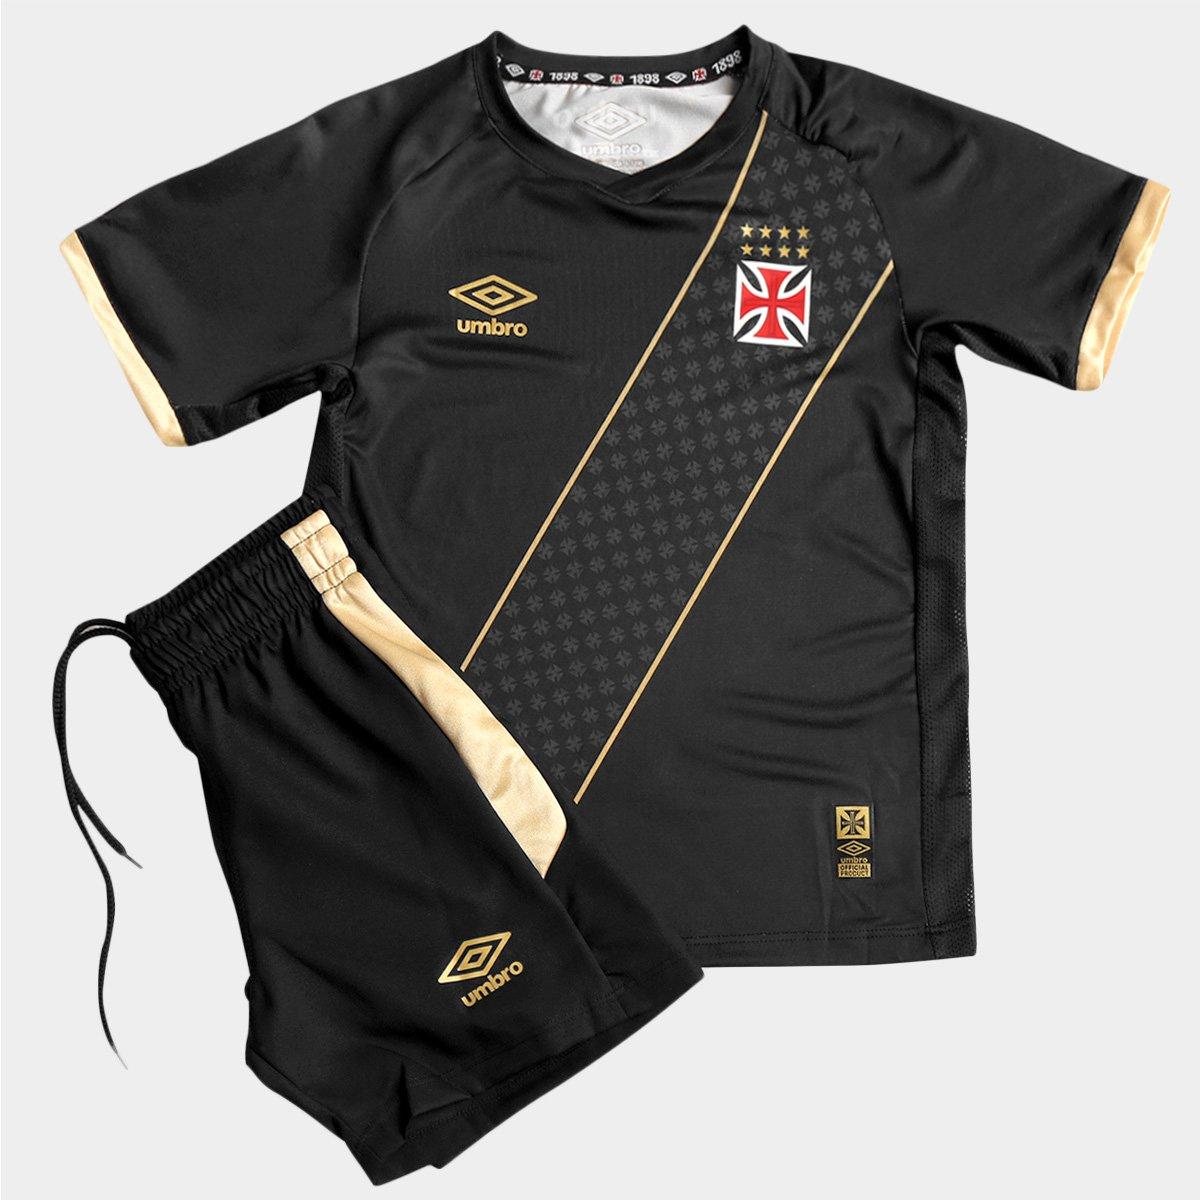 d98684500f Kit Umbro Vasco III 2015 Infantil - Compre Agora